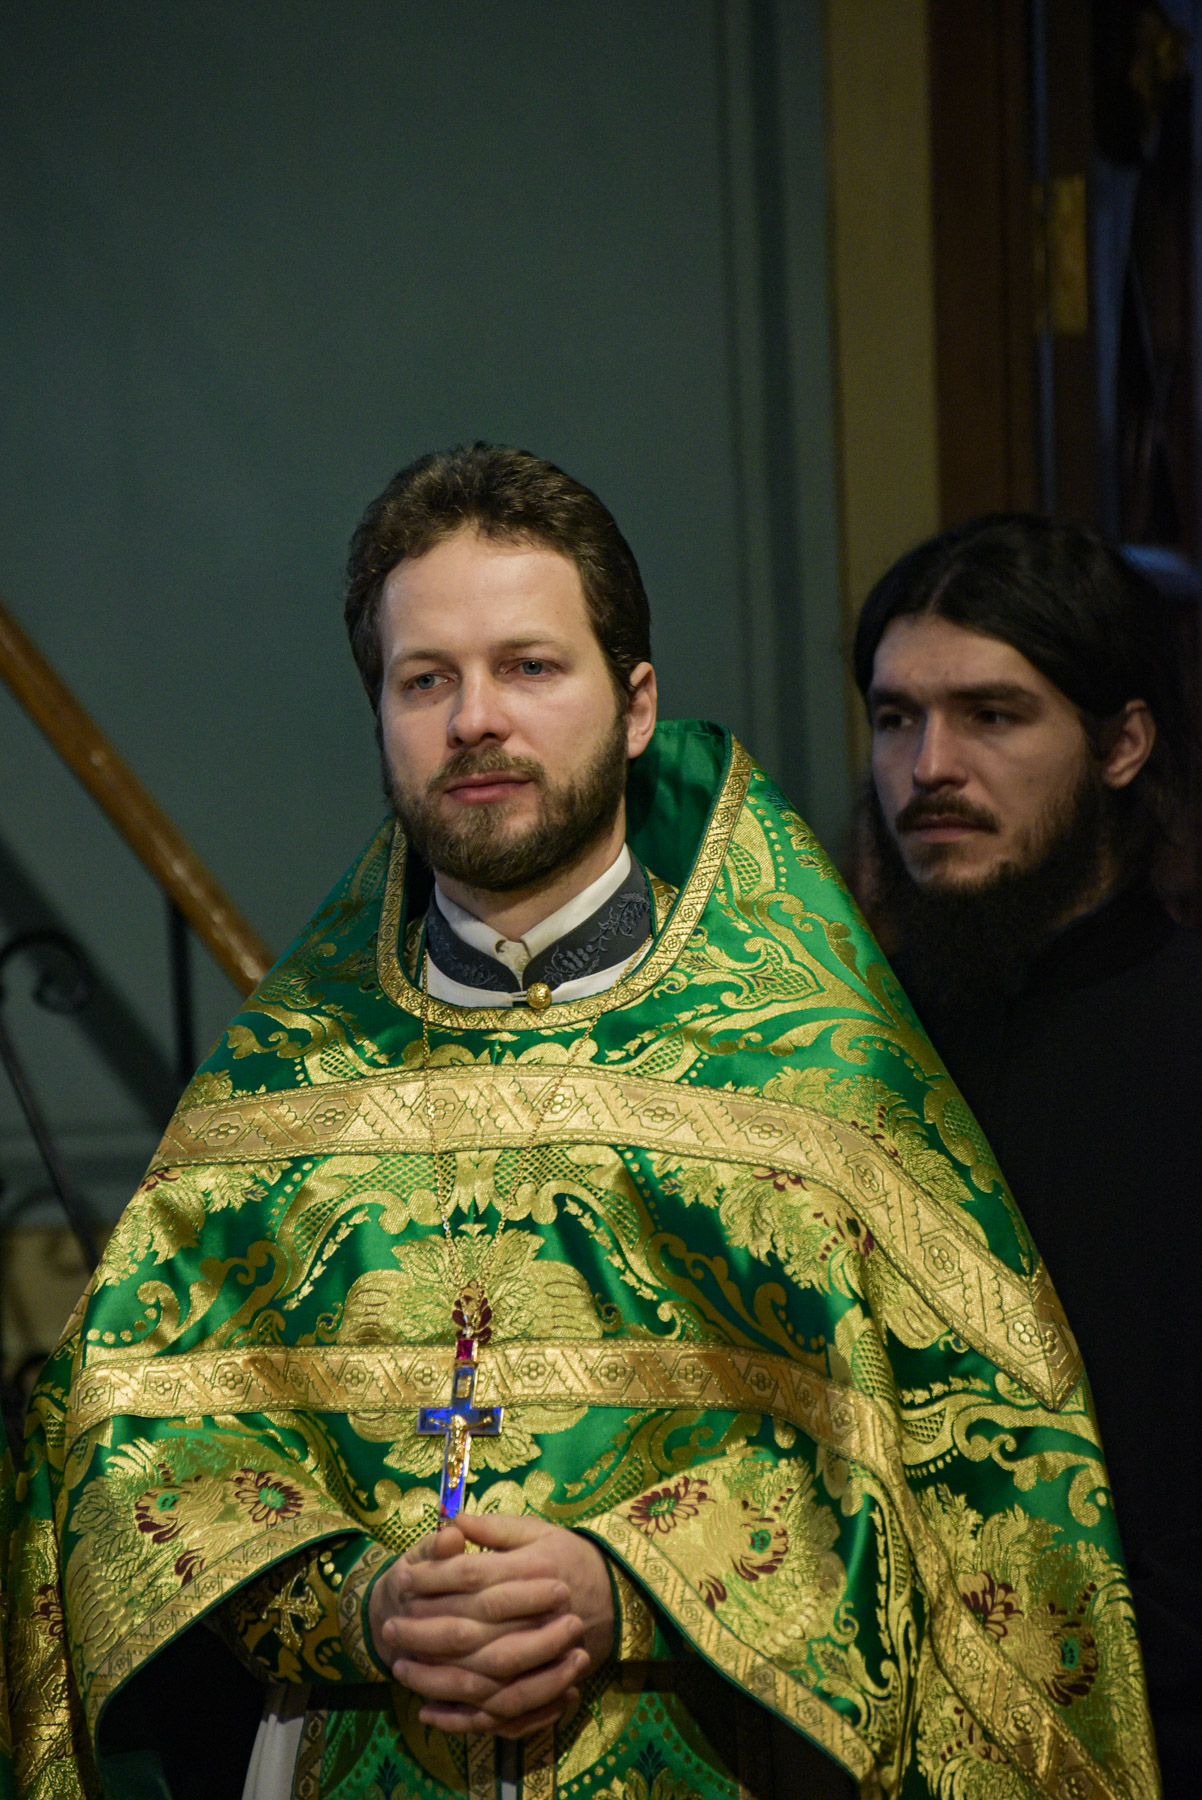 photos of orthodox christmas 0132 2